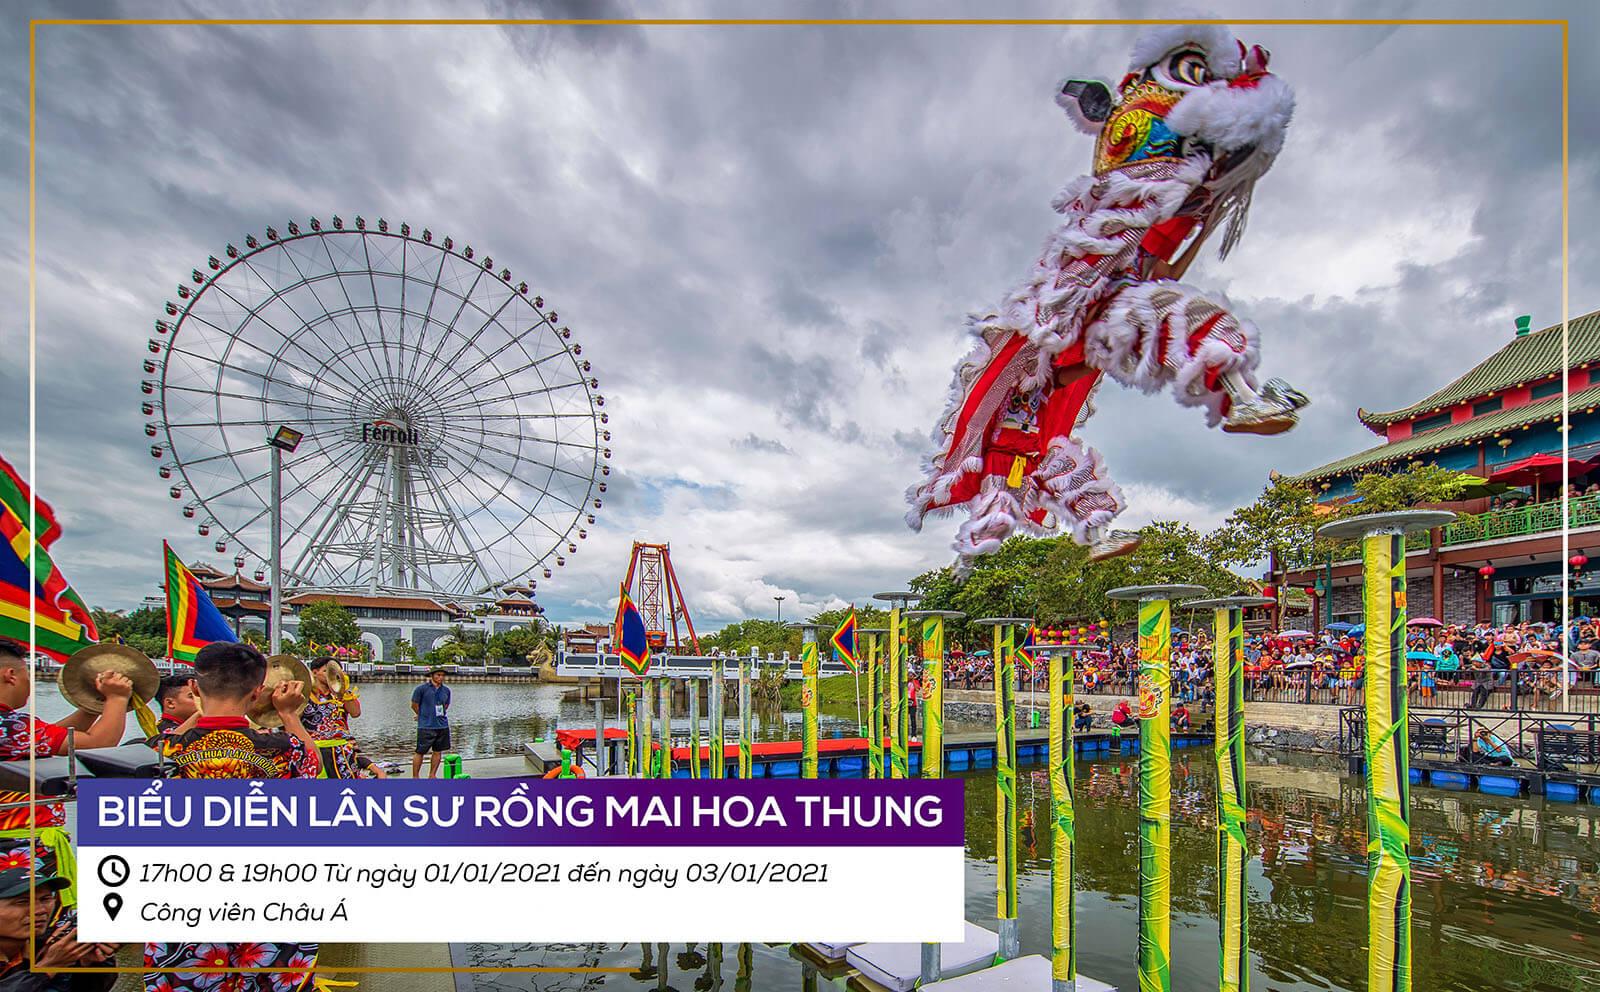 Le Hoi Da Nang Chao Nam Moi 2021 Bieu Dien Lan Su Rong